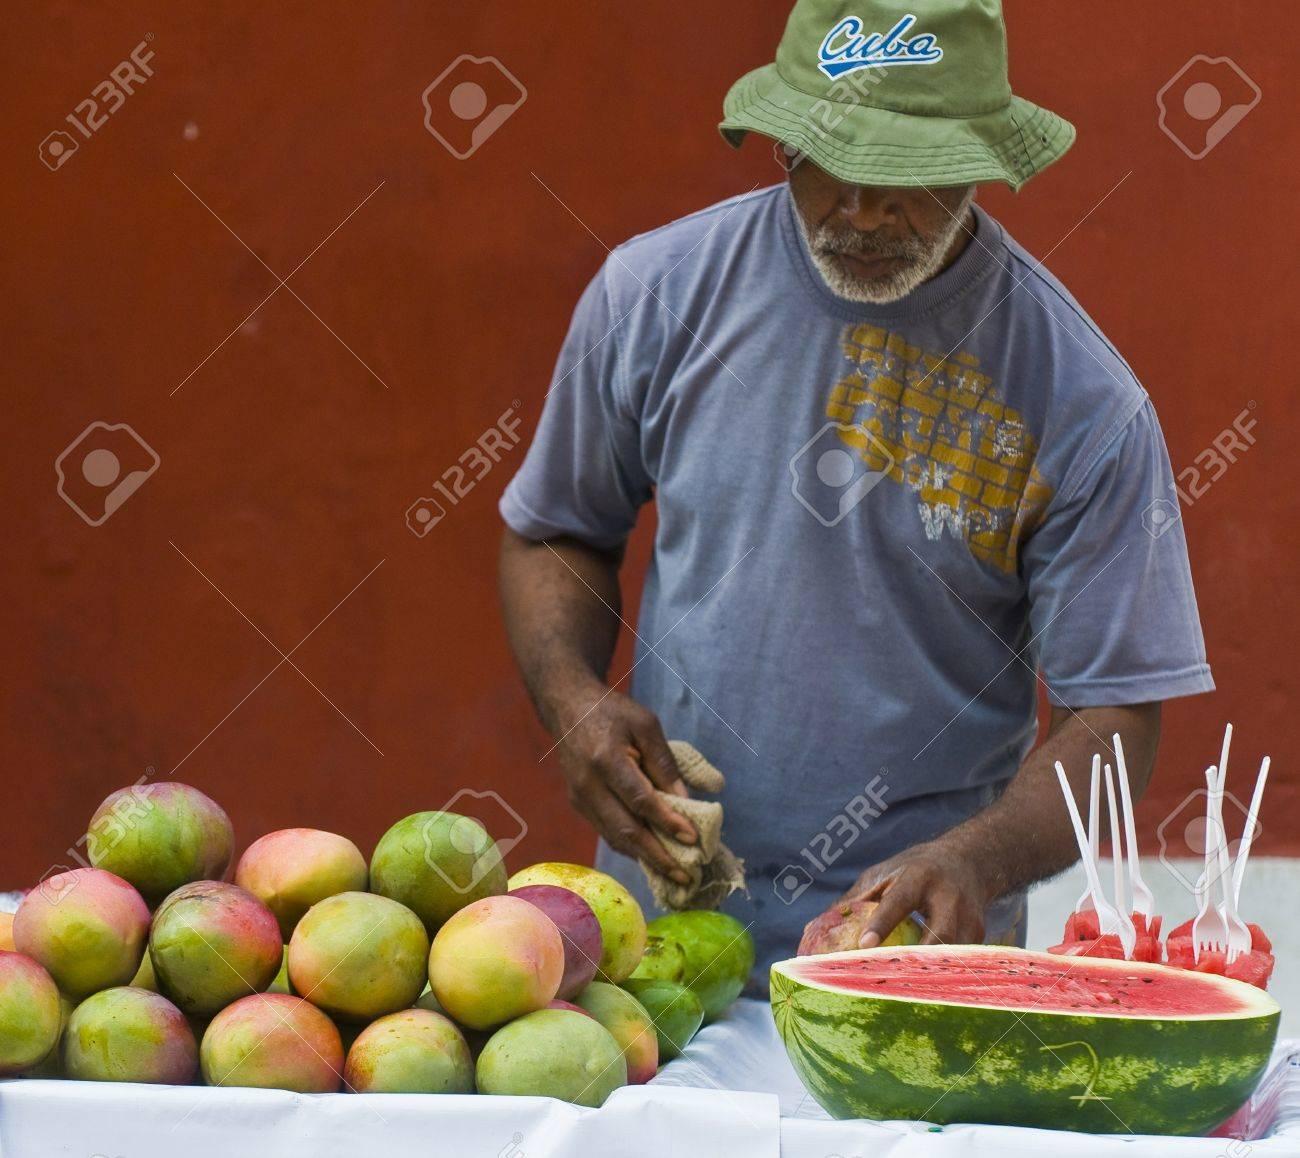 CARTAGENA DE INDIAS , COLOMBIA - DEC 21:Unidentified colombian man sell fruits in the street in Cartagena de Indias on December 21 2010 - 10986542